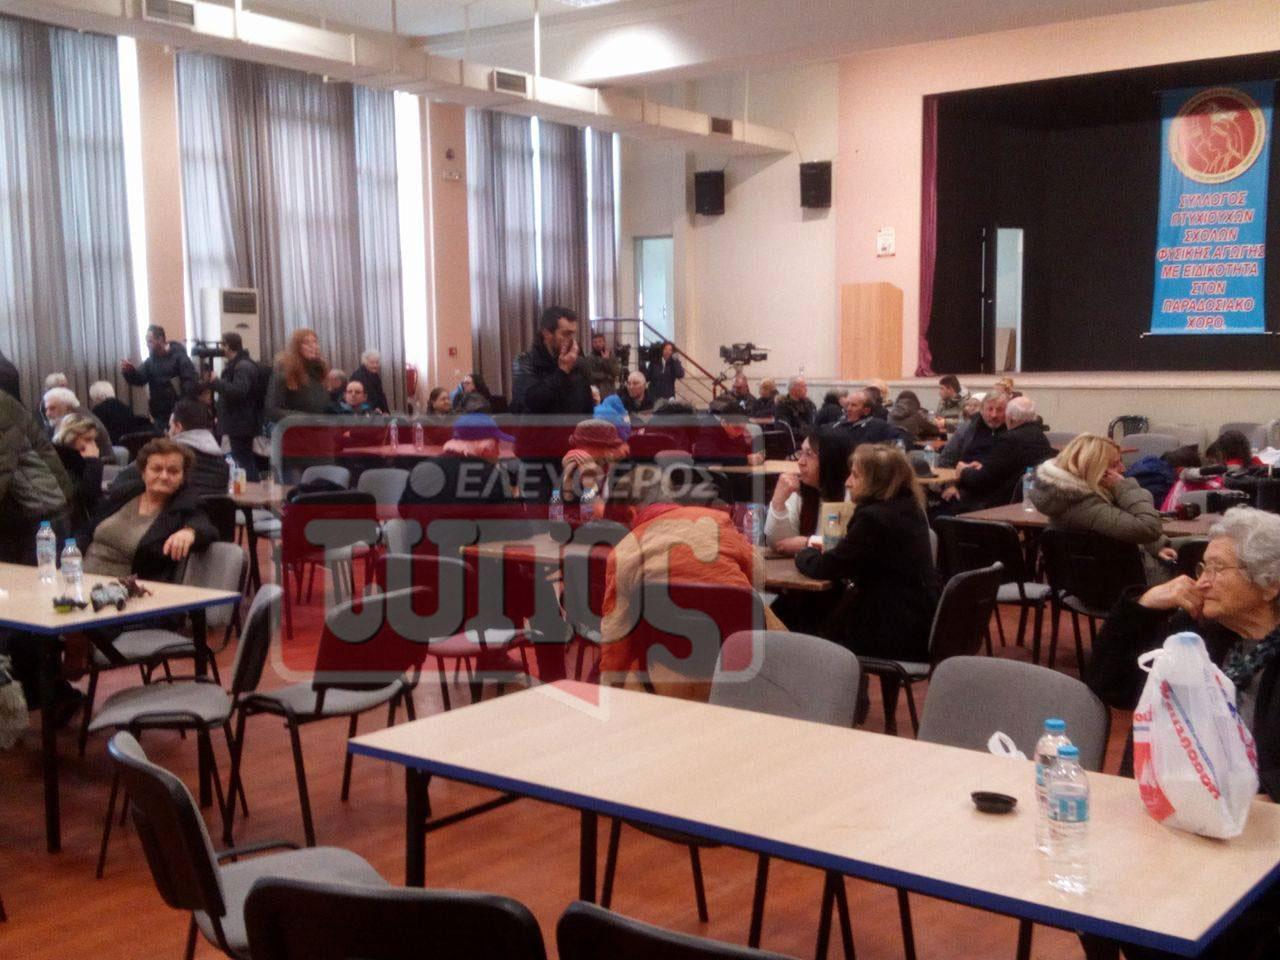 kordelio-katoikoi-ekkenosi-4 Λήξη συναγερμού στο Κορδελιό - Επιστρέφουν οι κάτοικοι